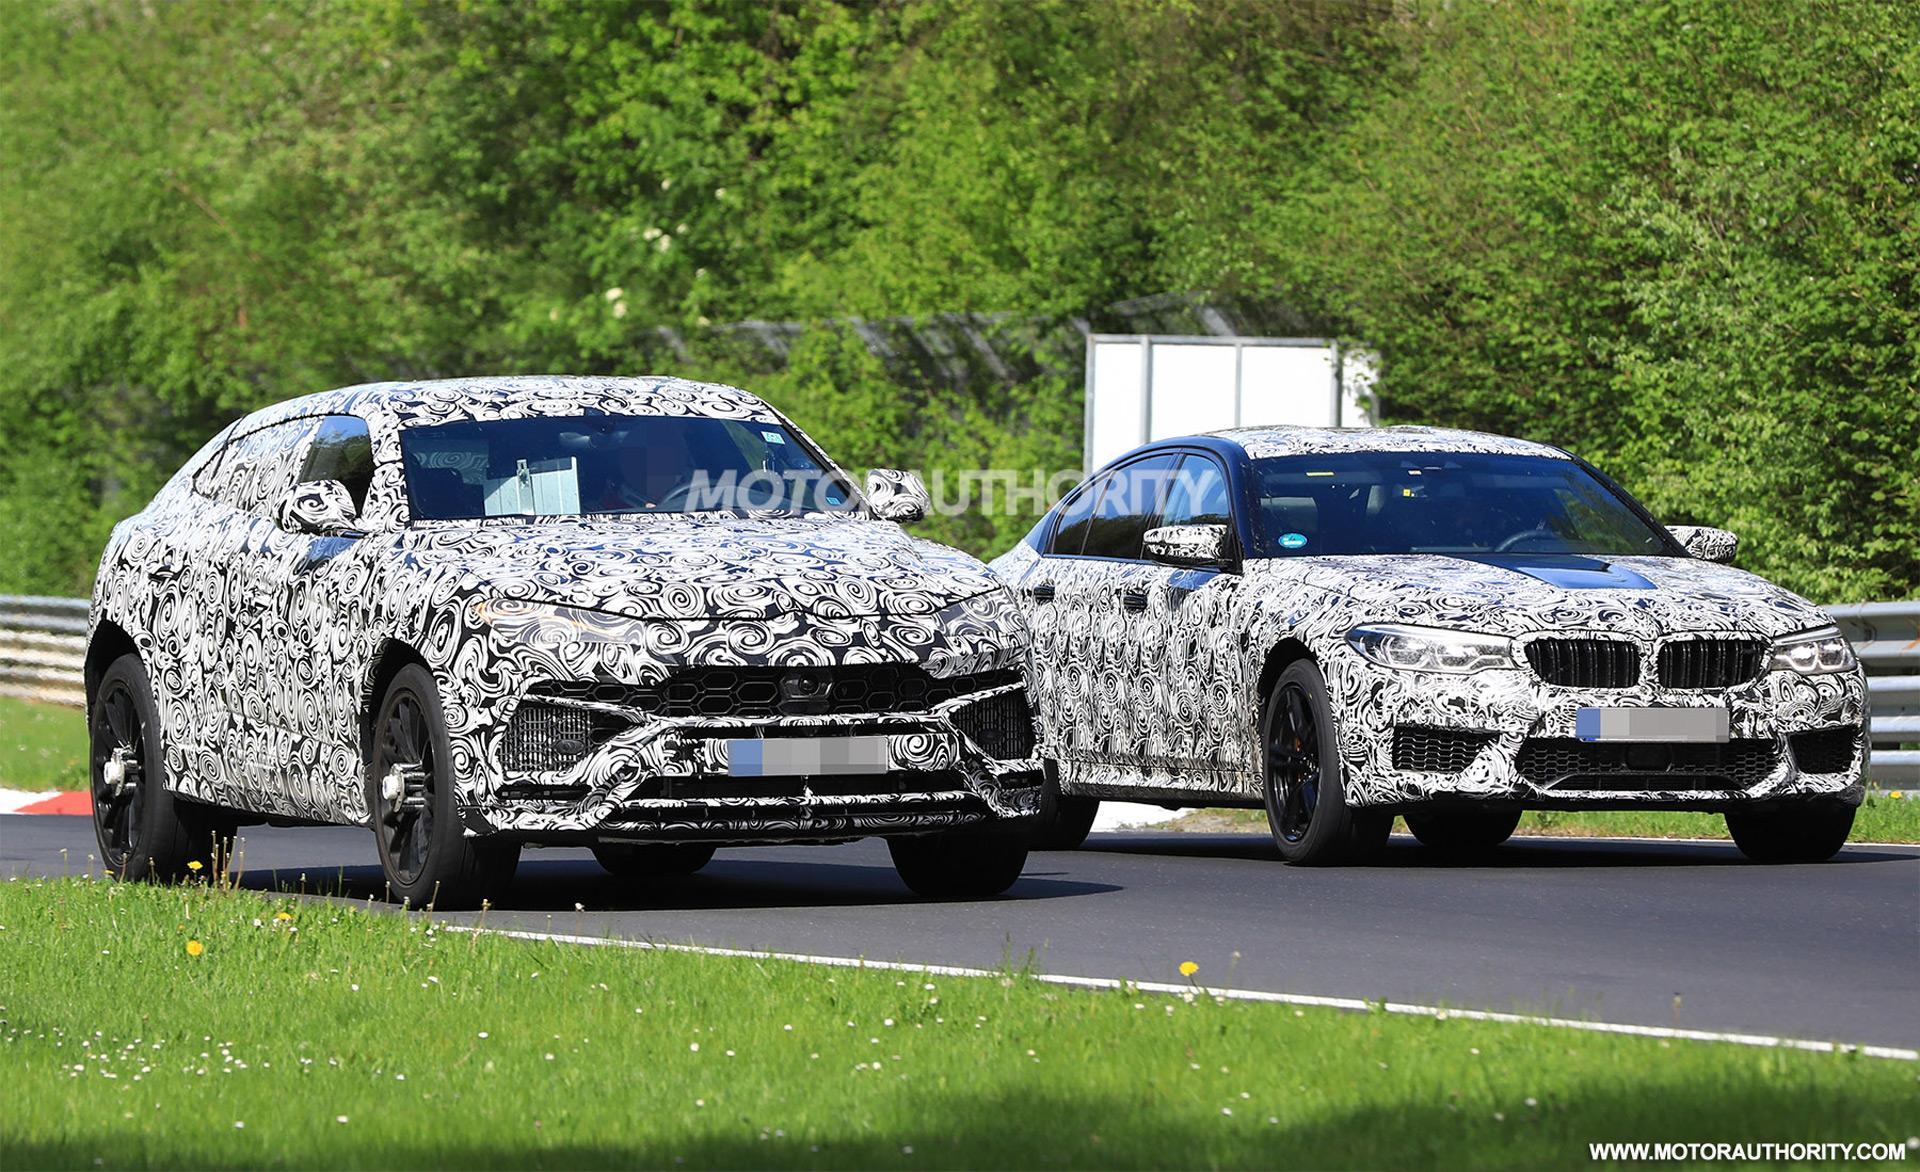 2019 Lamborghini Urus Spy Shots And Video Autozaurus